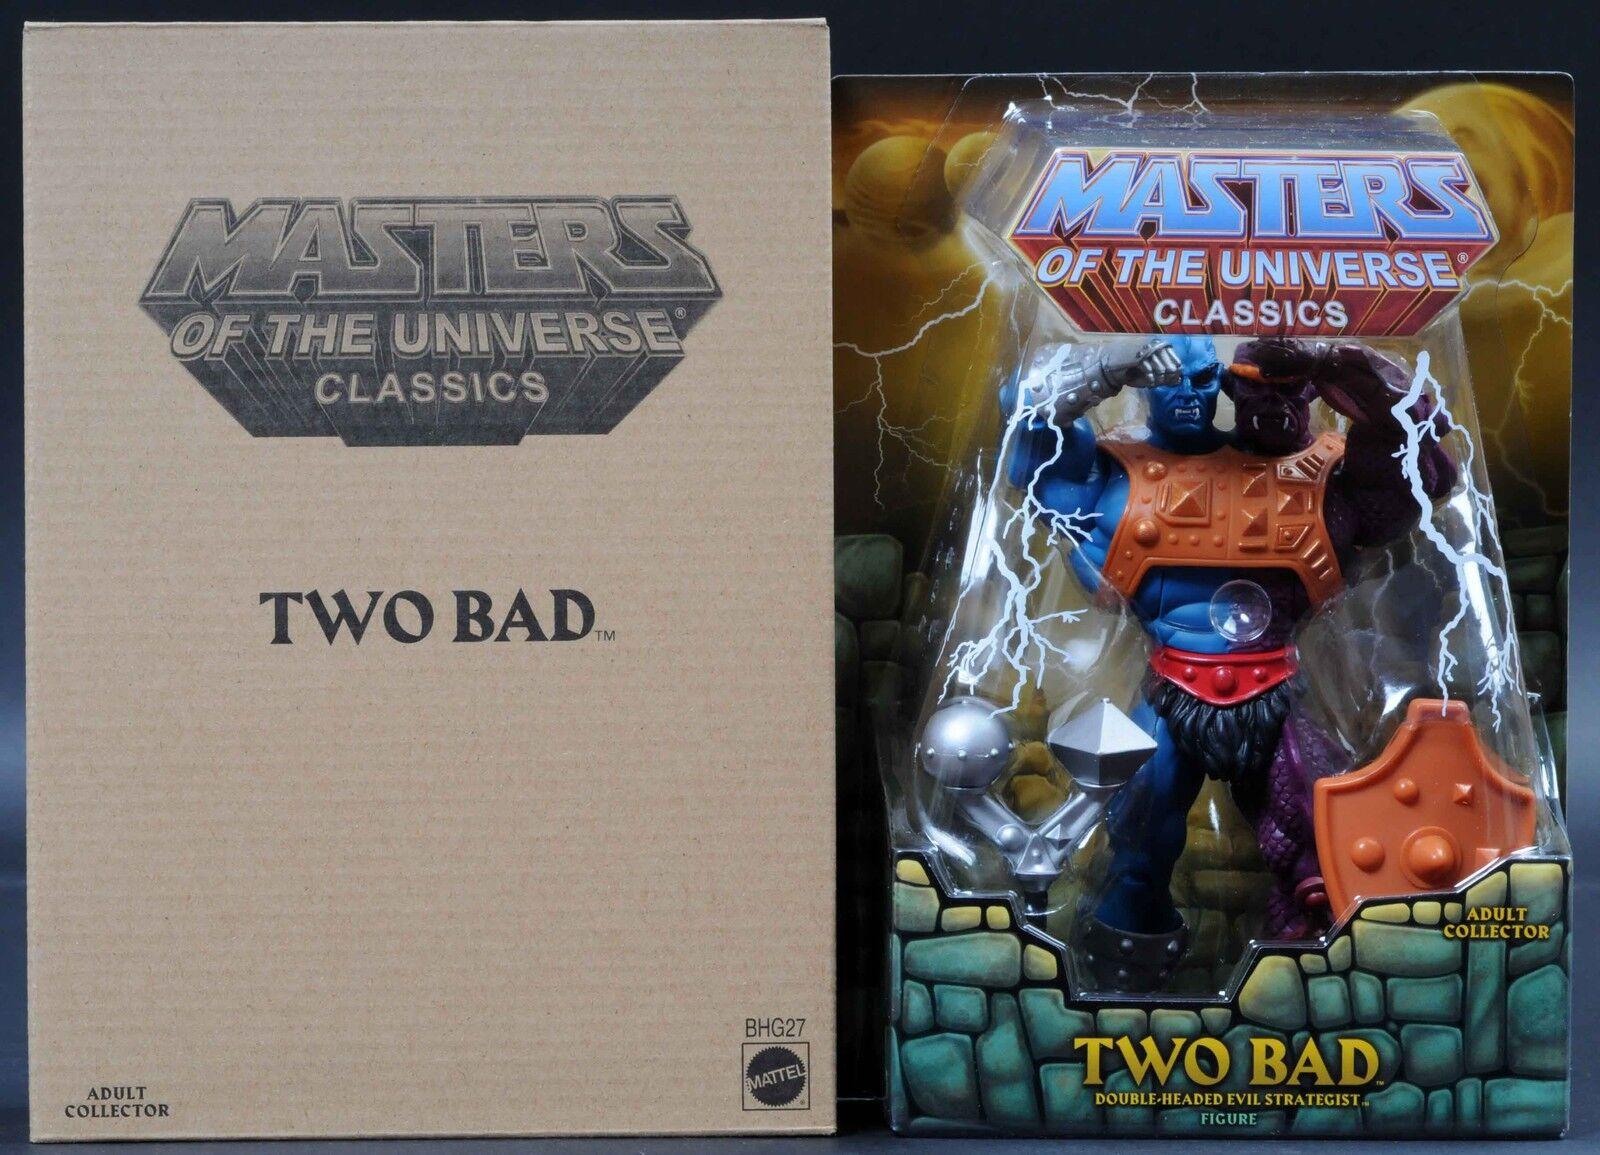 2014 Mattel Two-Bad MOTU MOTUC Masters of the Universe Classics MOC